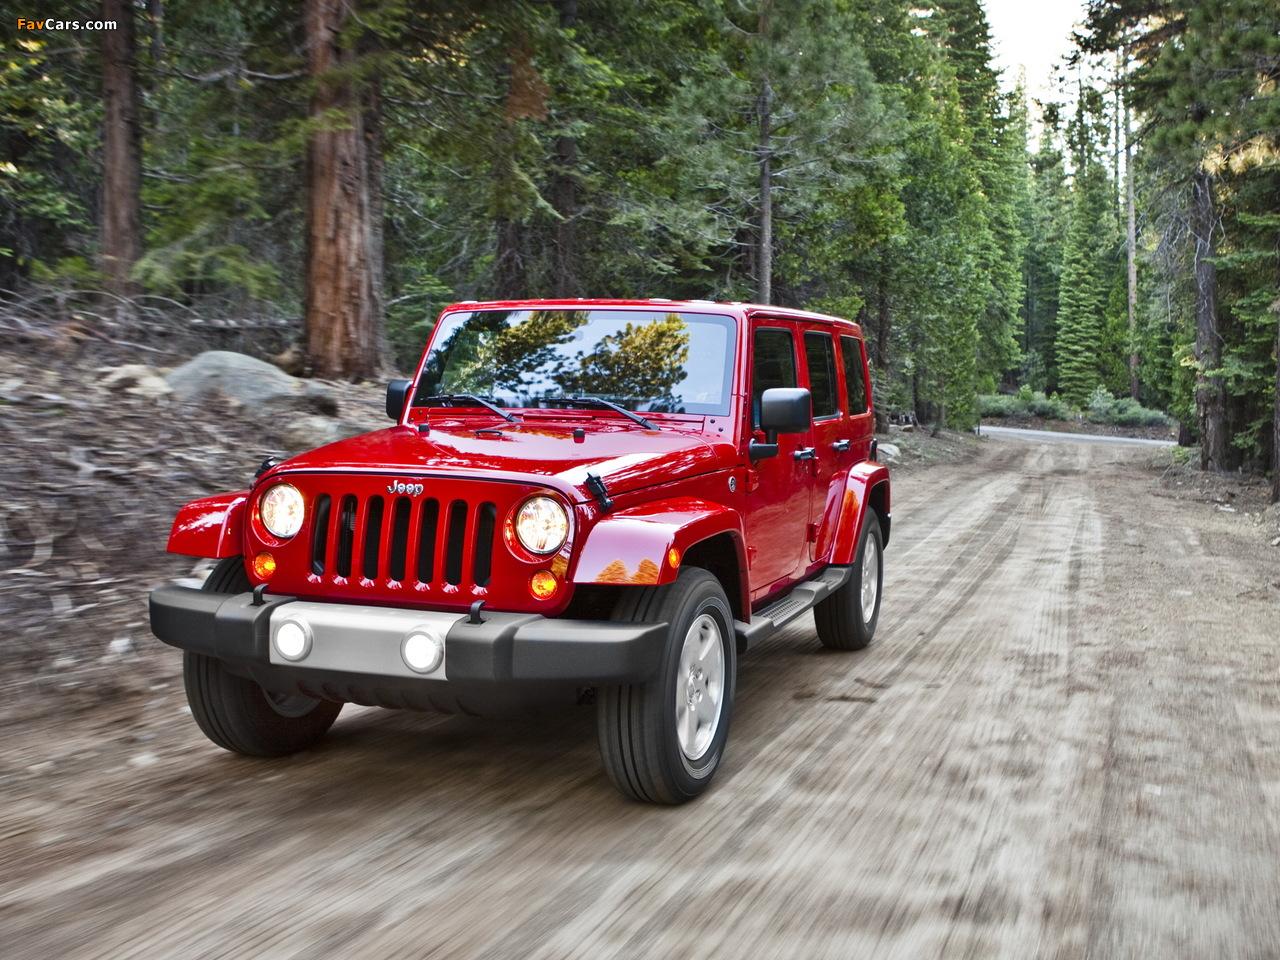 Jeep Wrangler Unlimited Sahara (JK) 2010 wallpapers (1280 x 960)